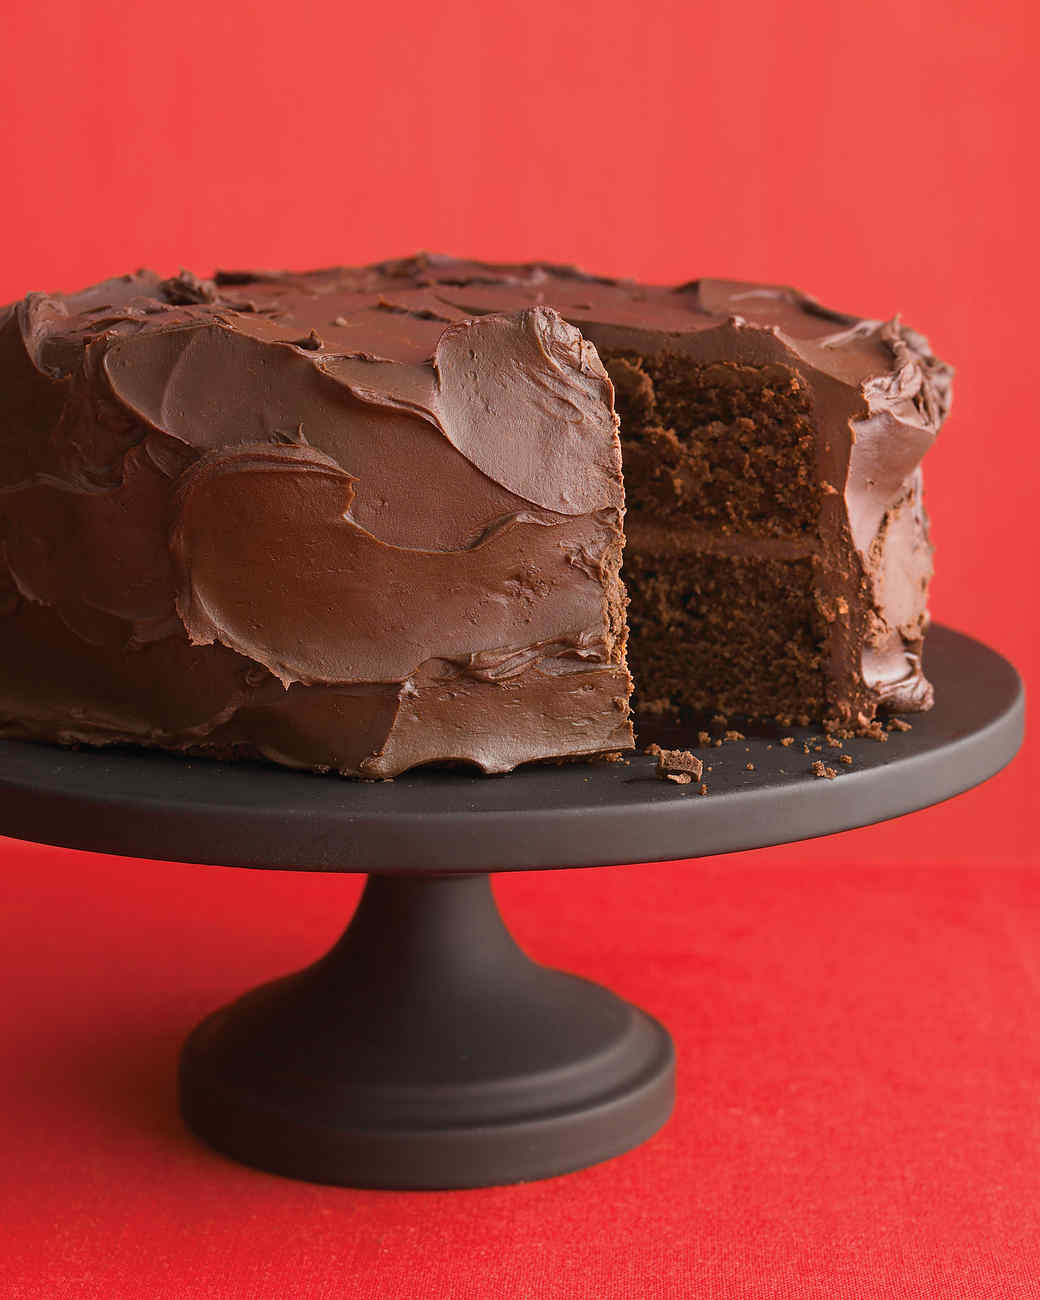 Chocolate cake recipe with ganache icing